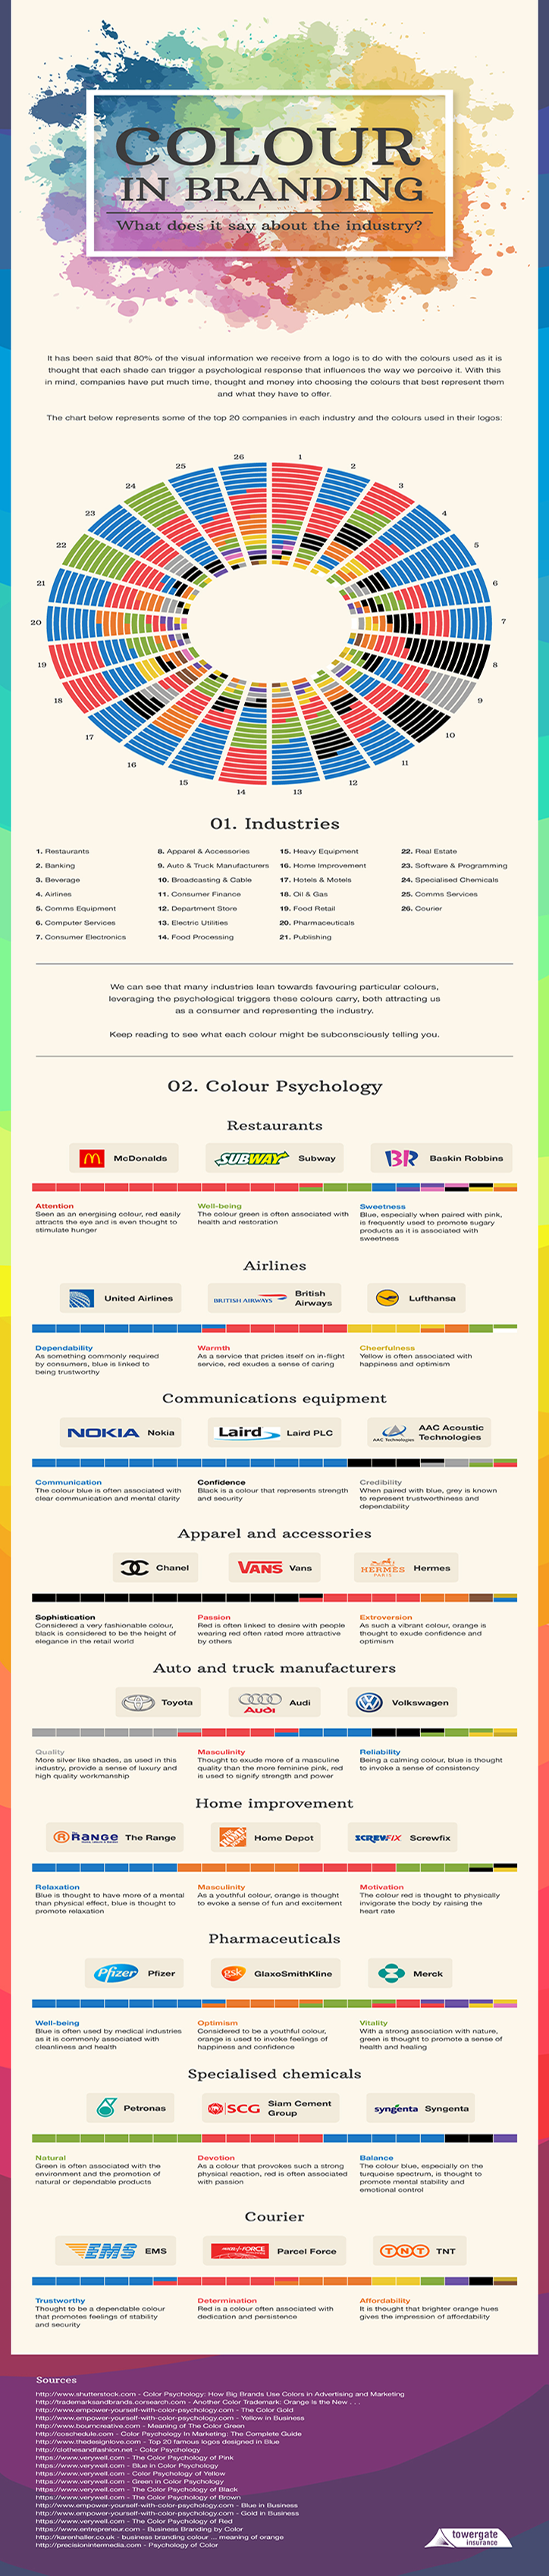 renk-psikolojisi-infografik